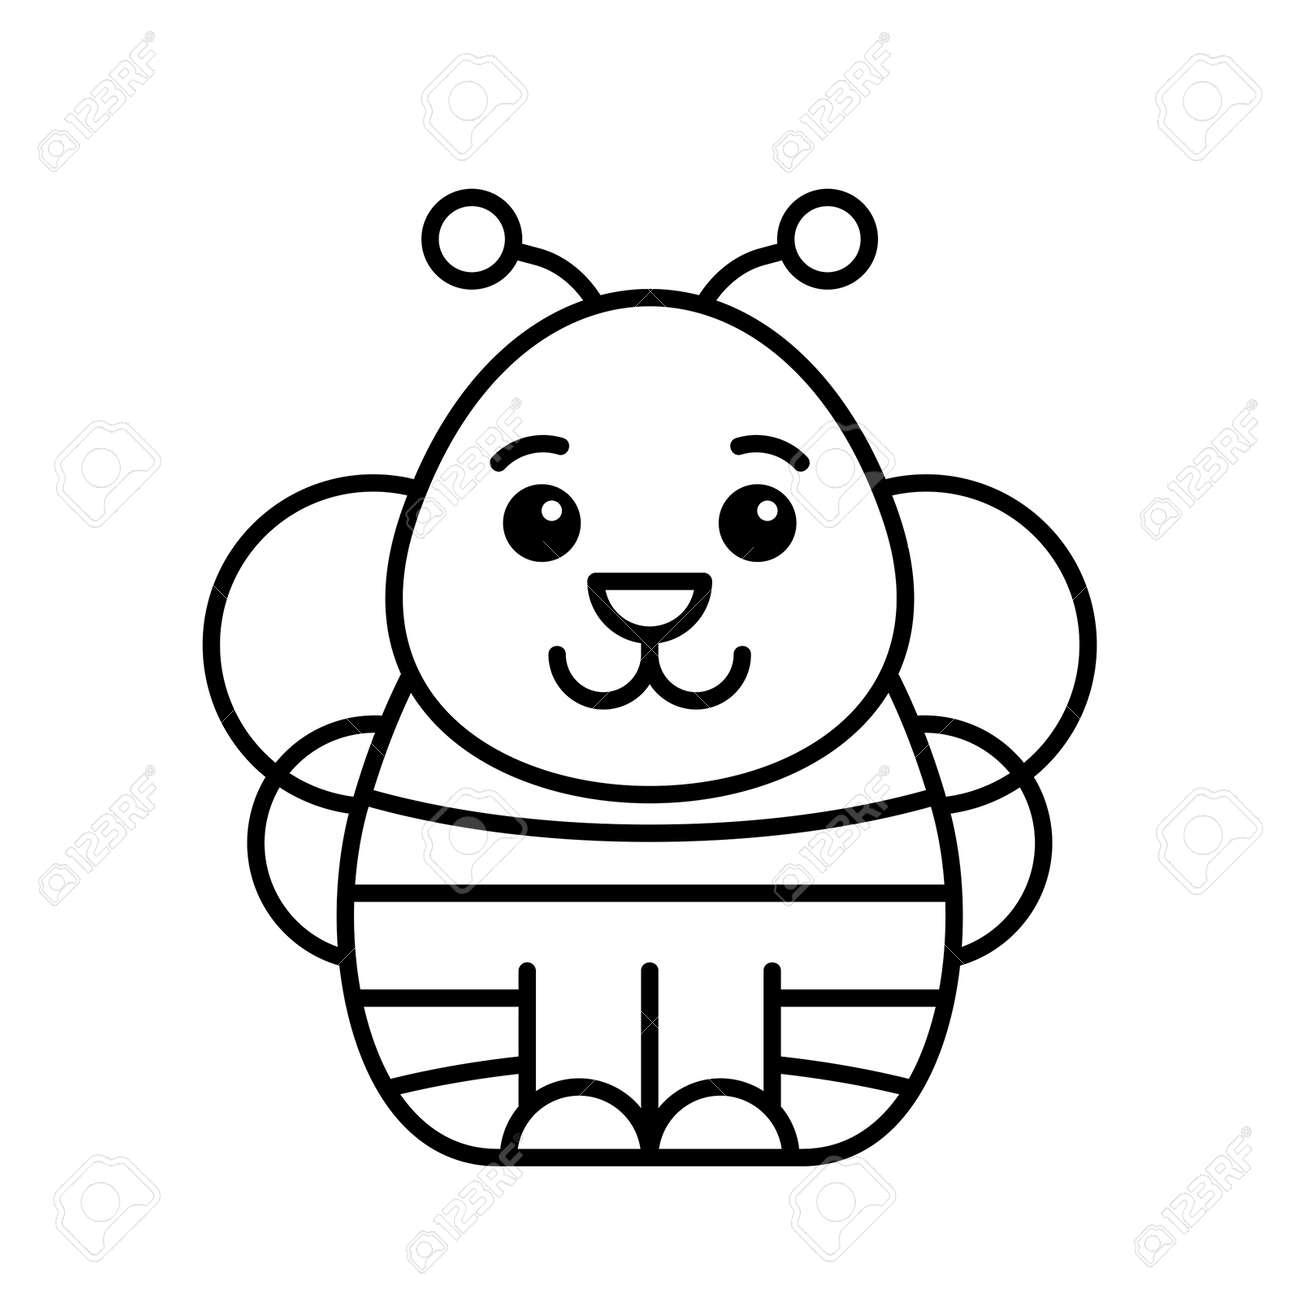 Bee icon. Icon design. Template elements - 171231682